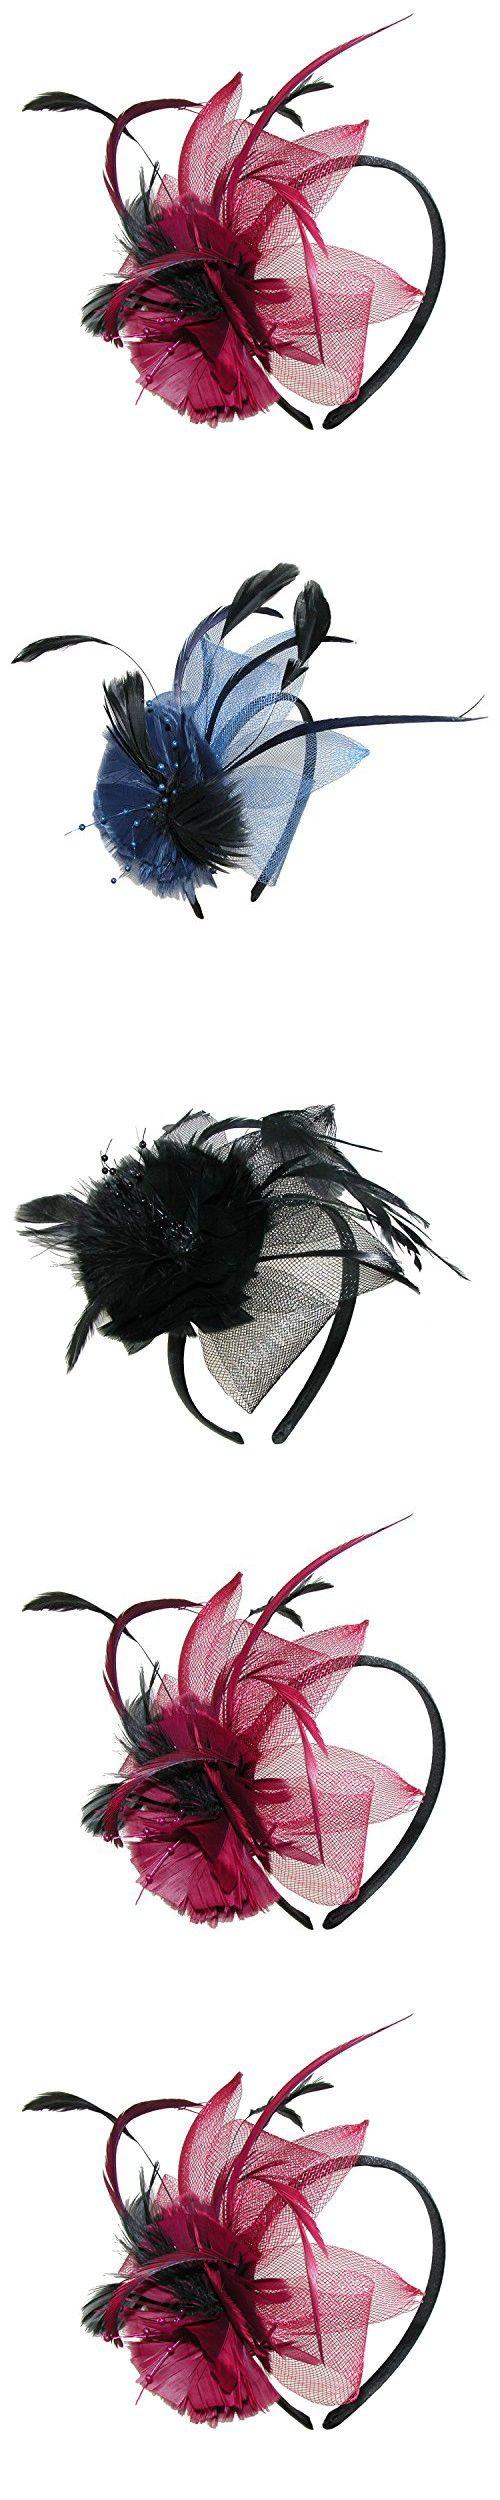 Jeanne Simmons Women's Feather Sinamay Bow Fascinator Headband, Burgundy